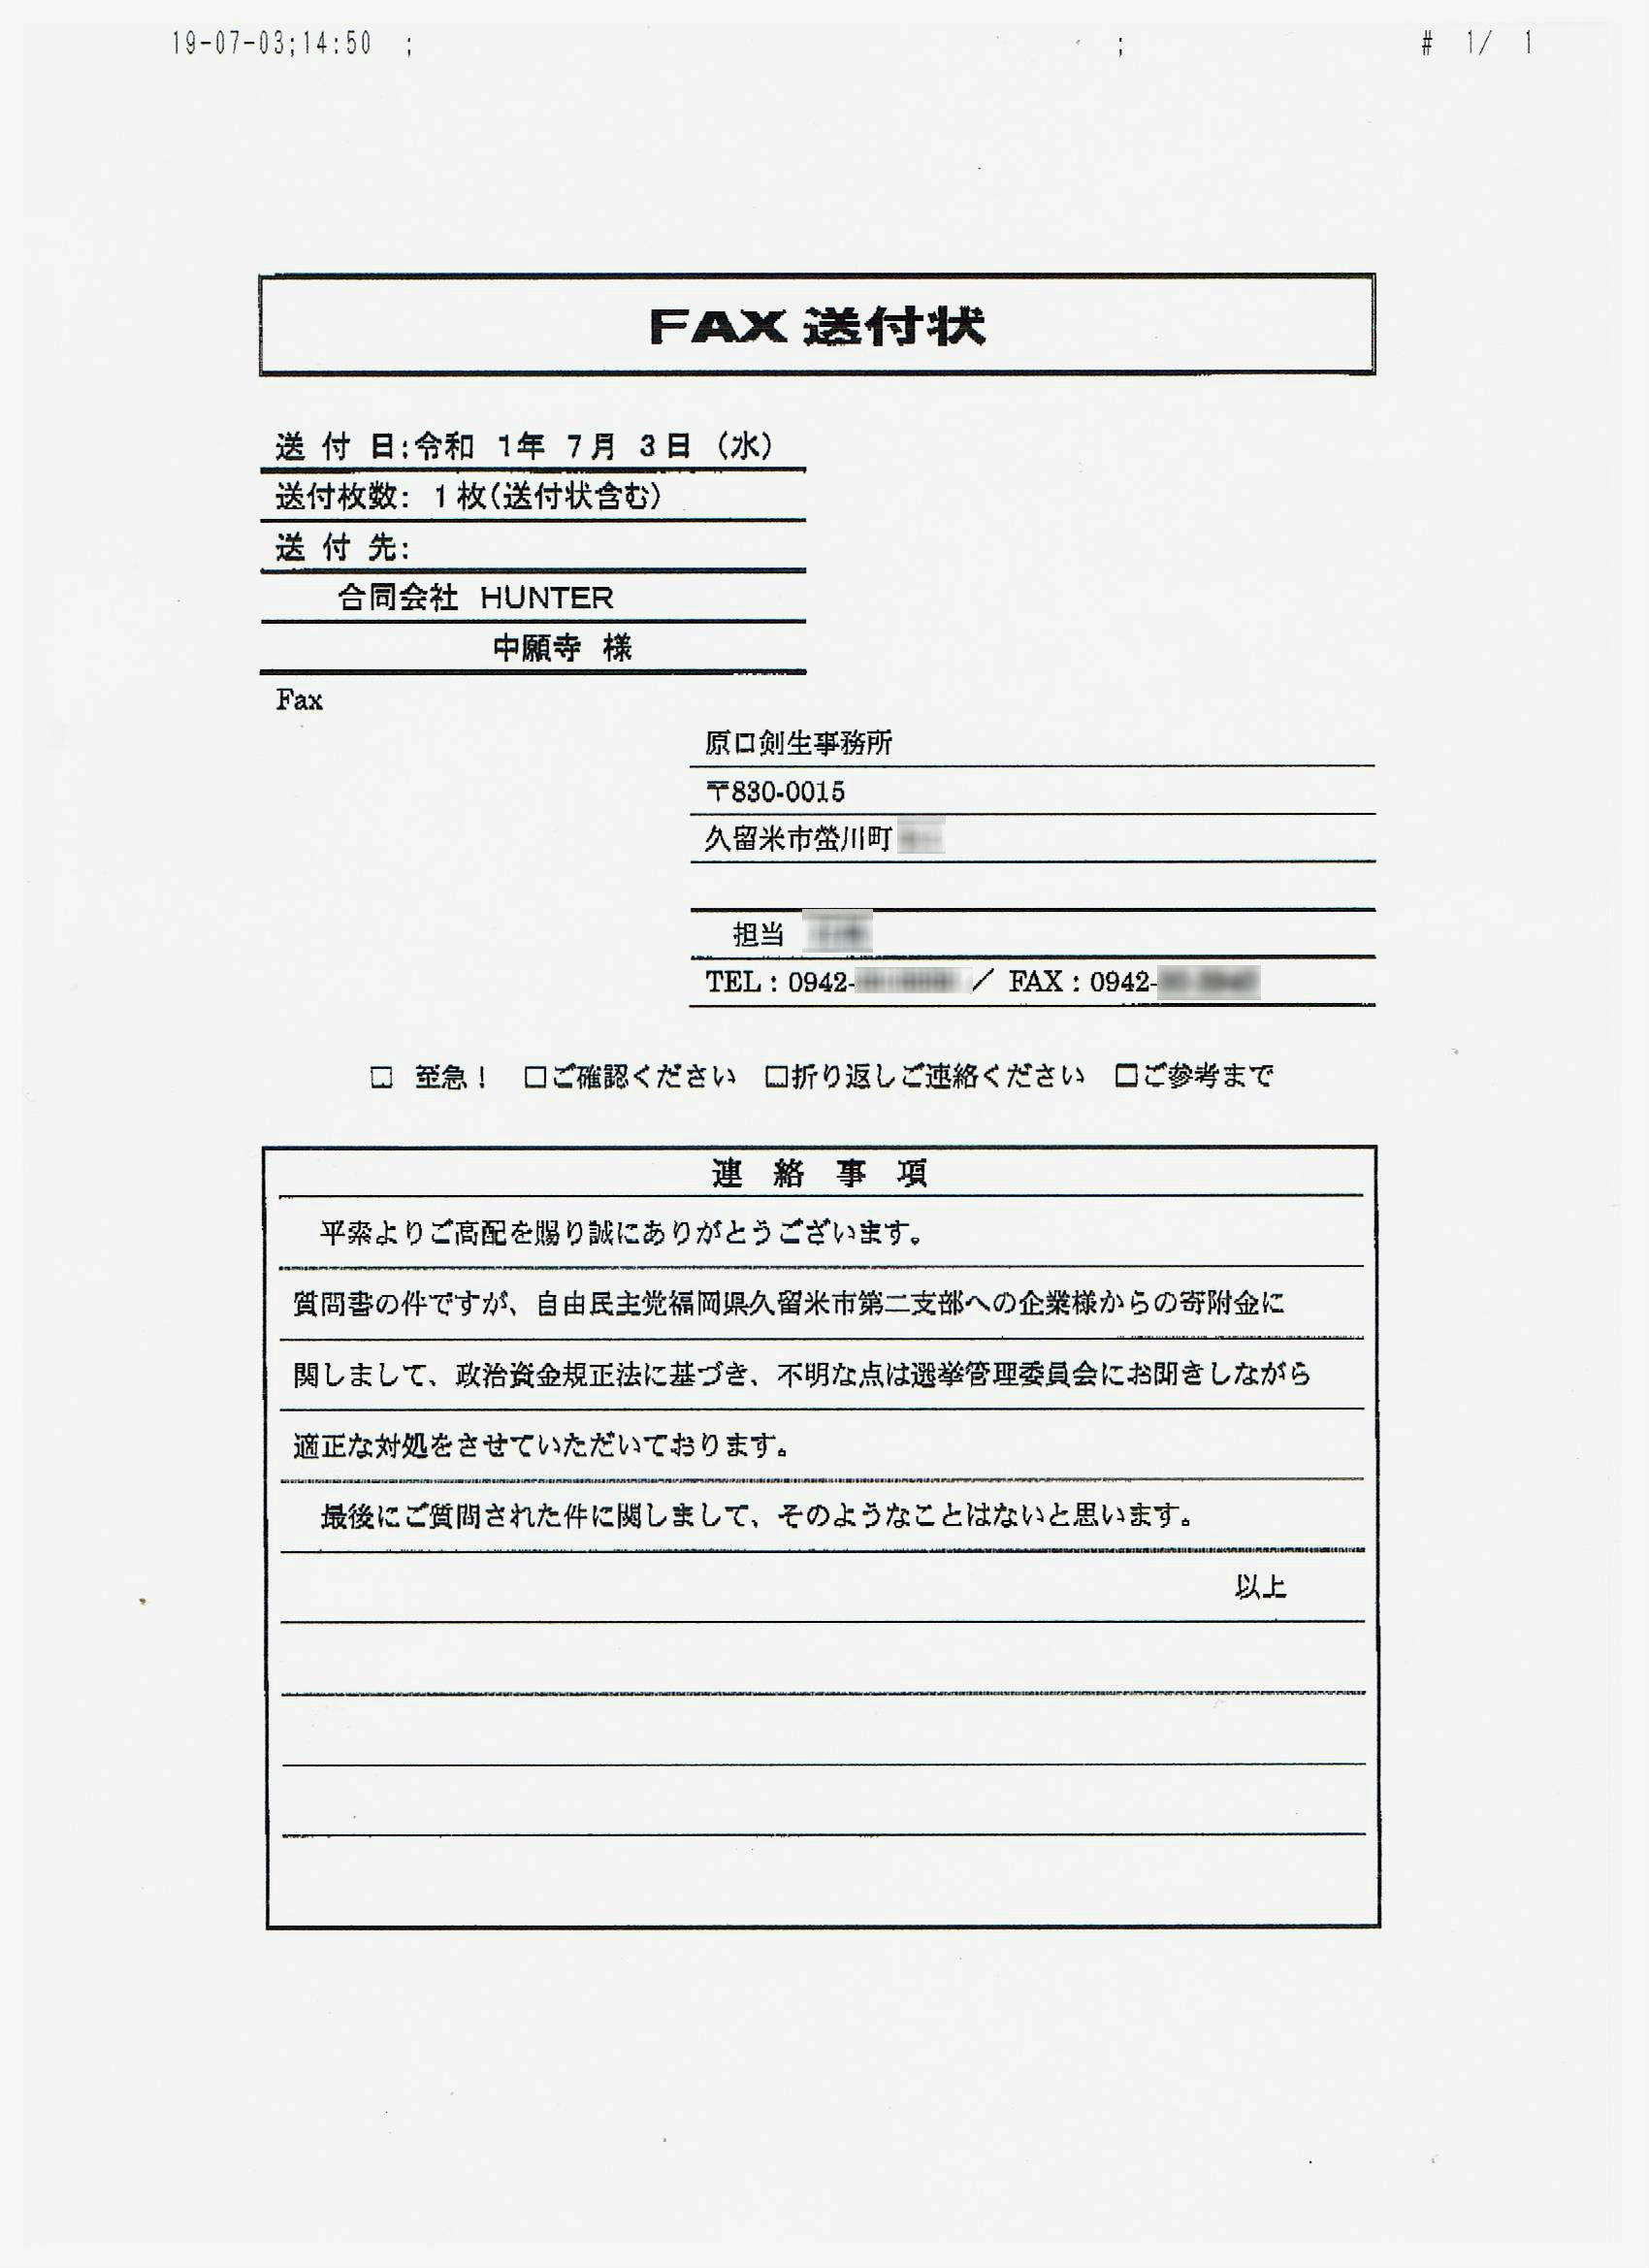 http://hunter-investigate.jp/news/b42035c3c892bcd6466a54a9bcb909a9d2b12535.jpg